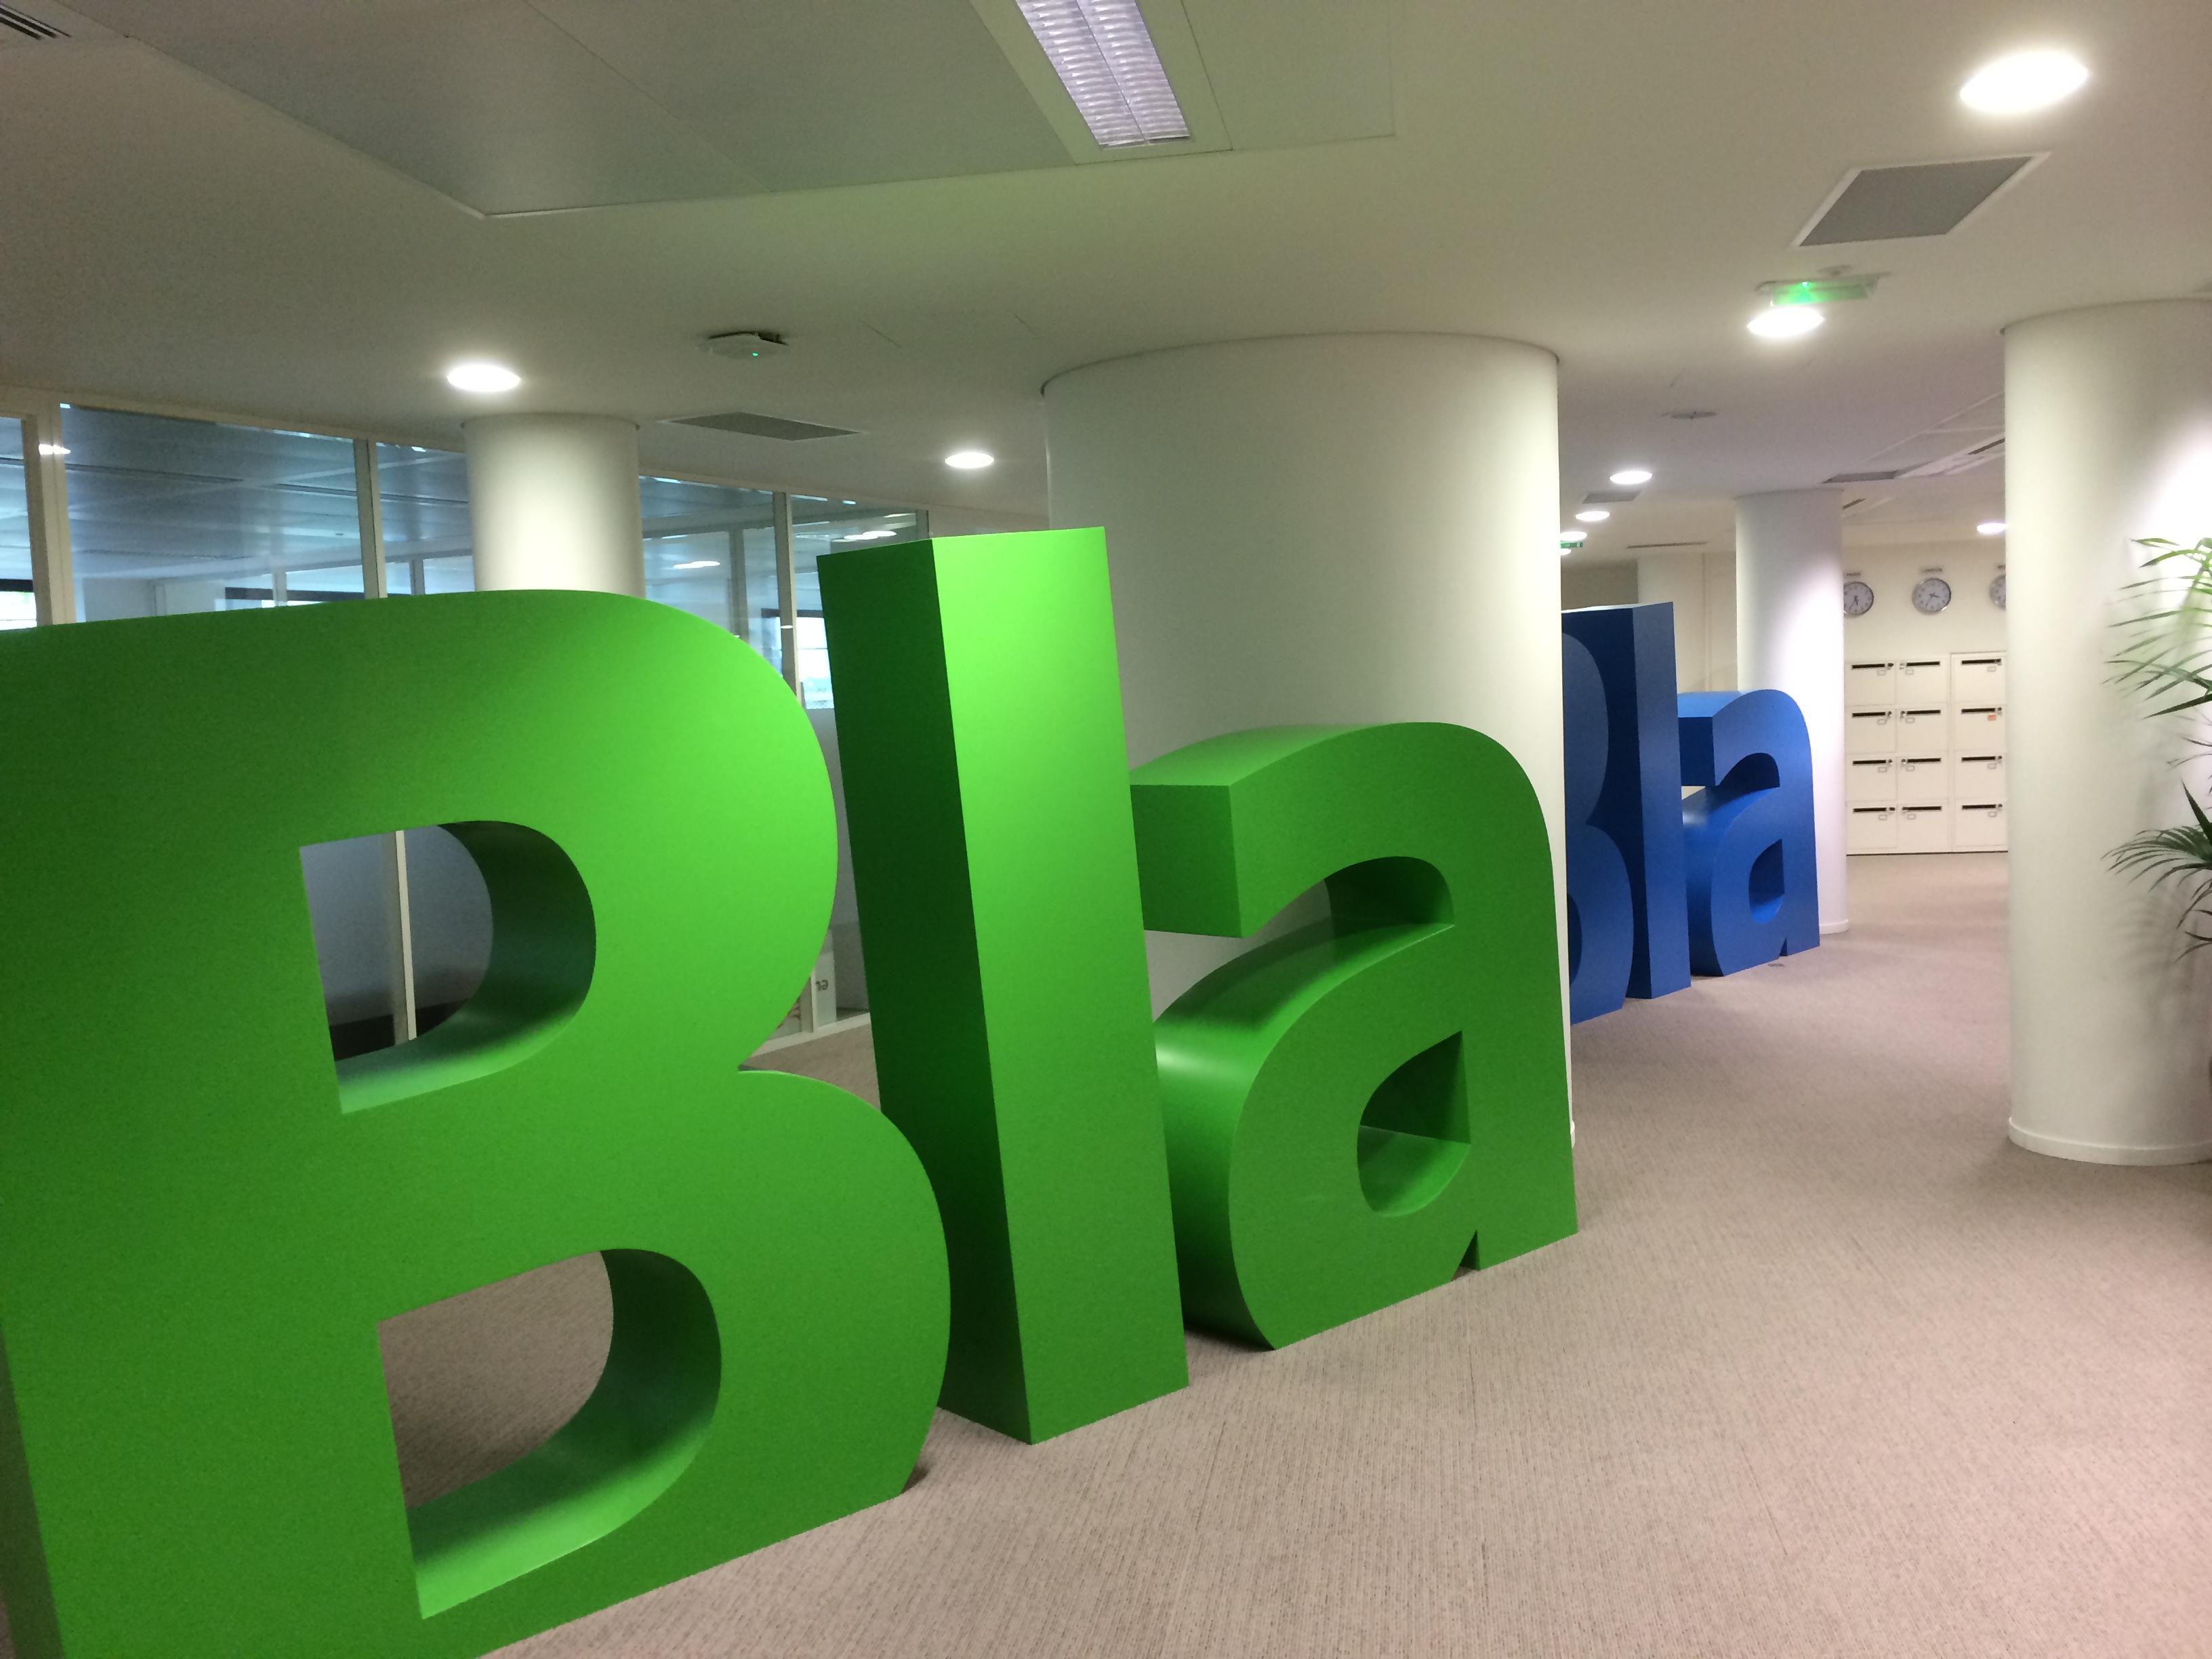 BlaBlaCar's offices, image courtesy of Om Malik.